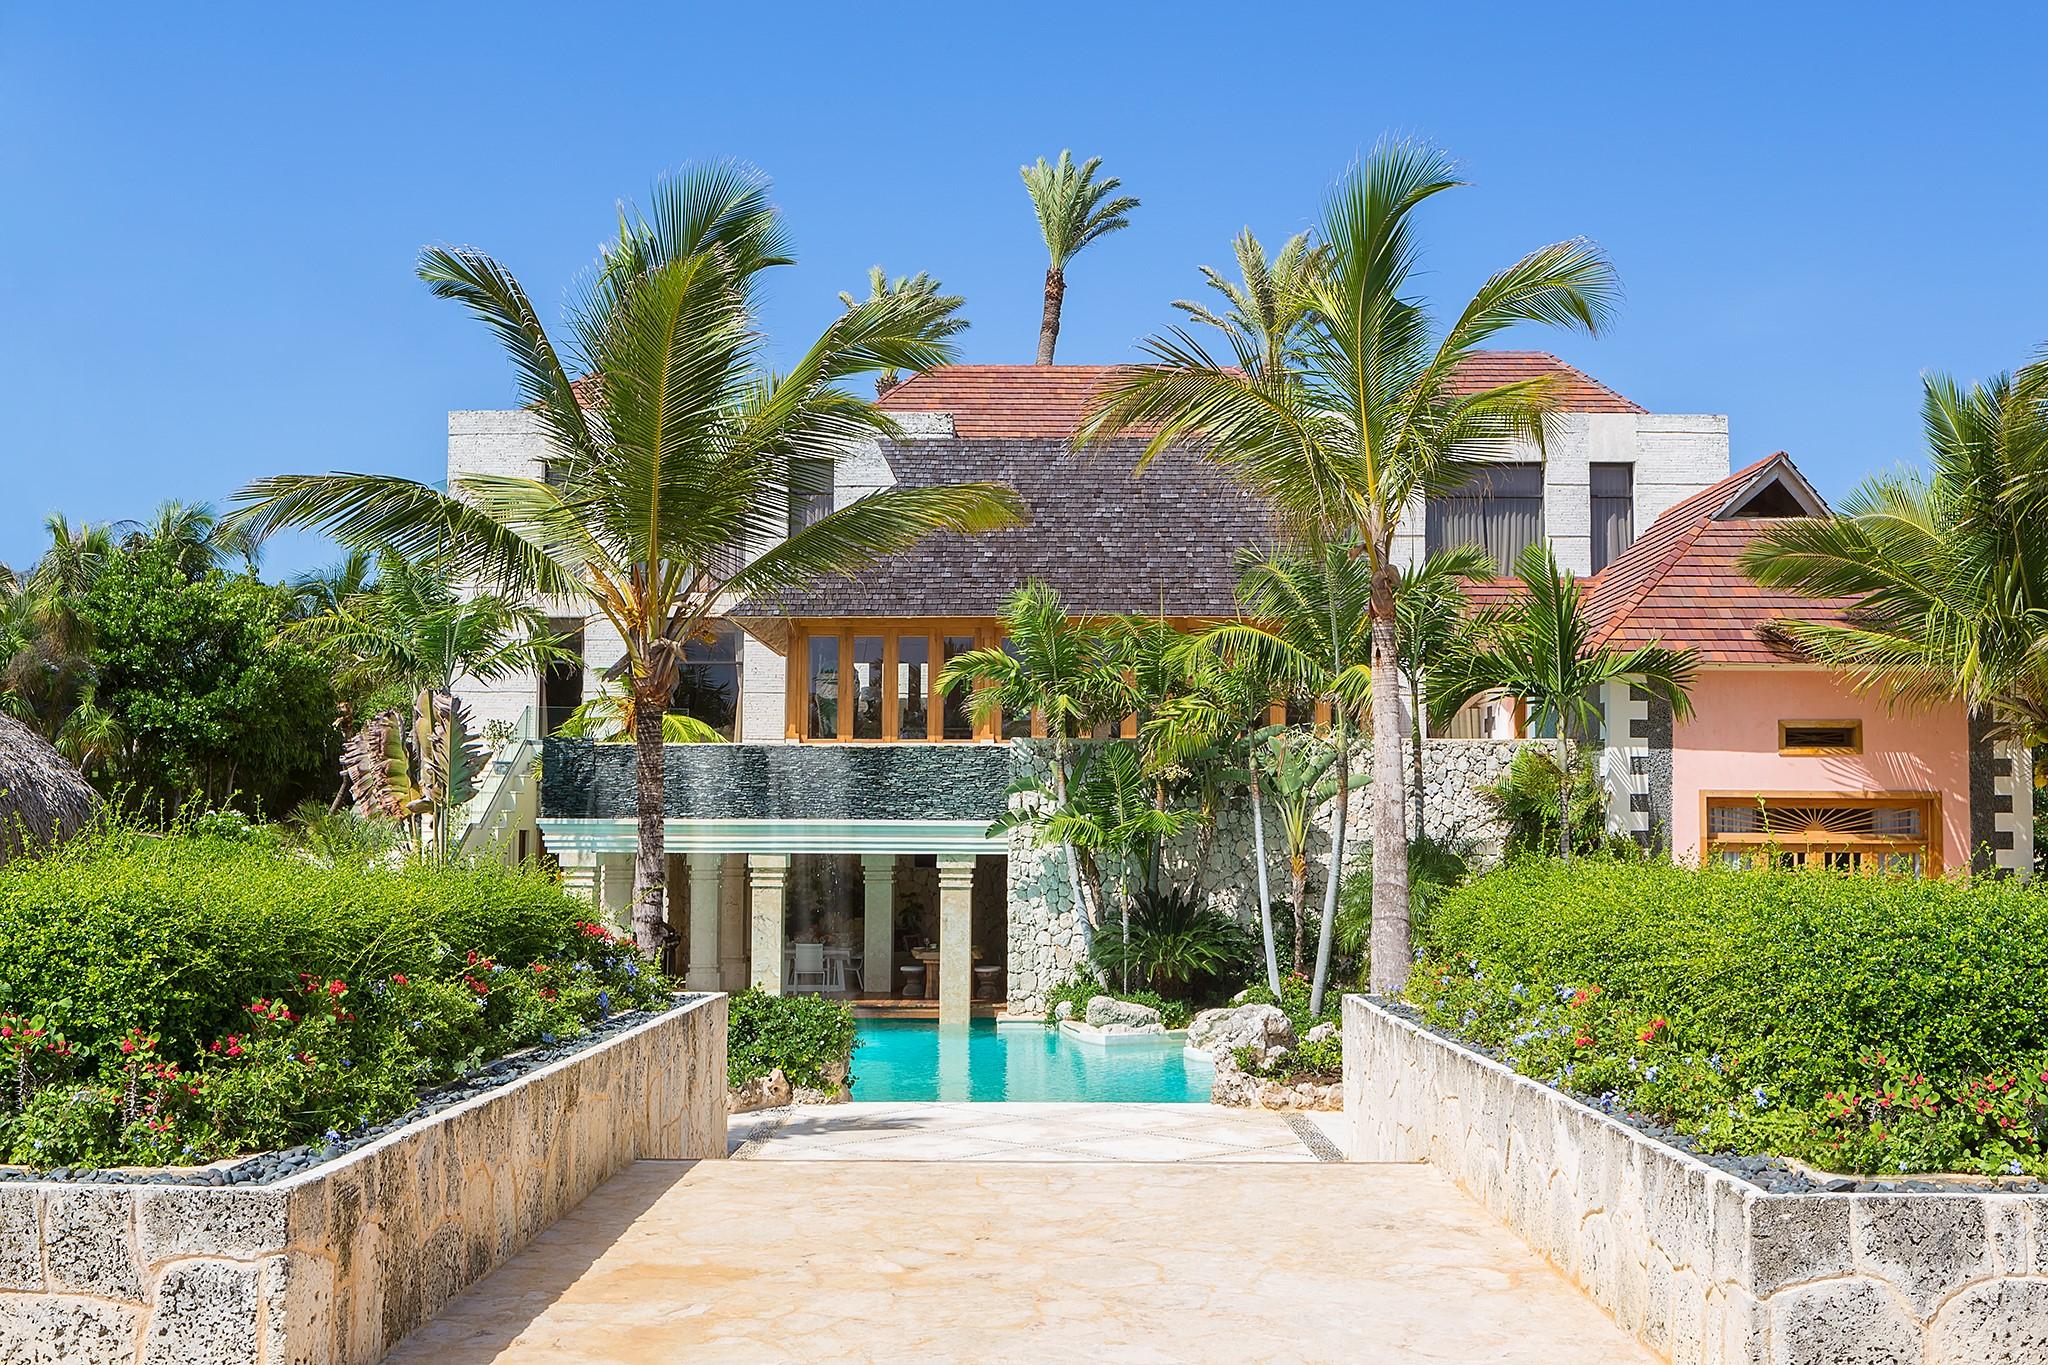 <b>5 Bedrooms, 14,897 sq. ft.</b><br/>Jack Nicklaus Signature Golf Front Villa and Ocean Views